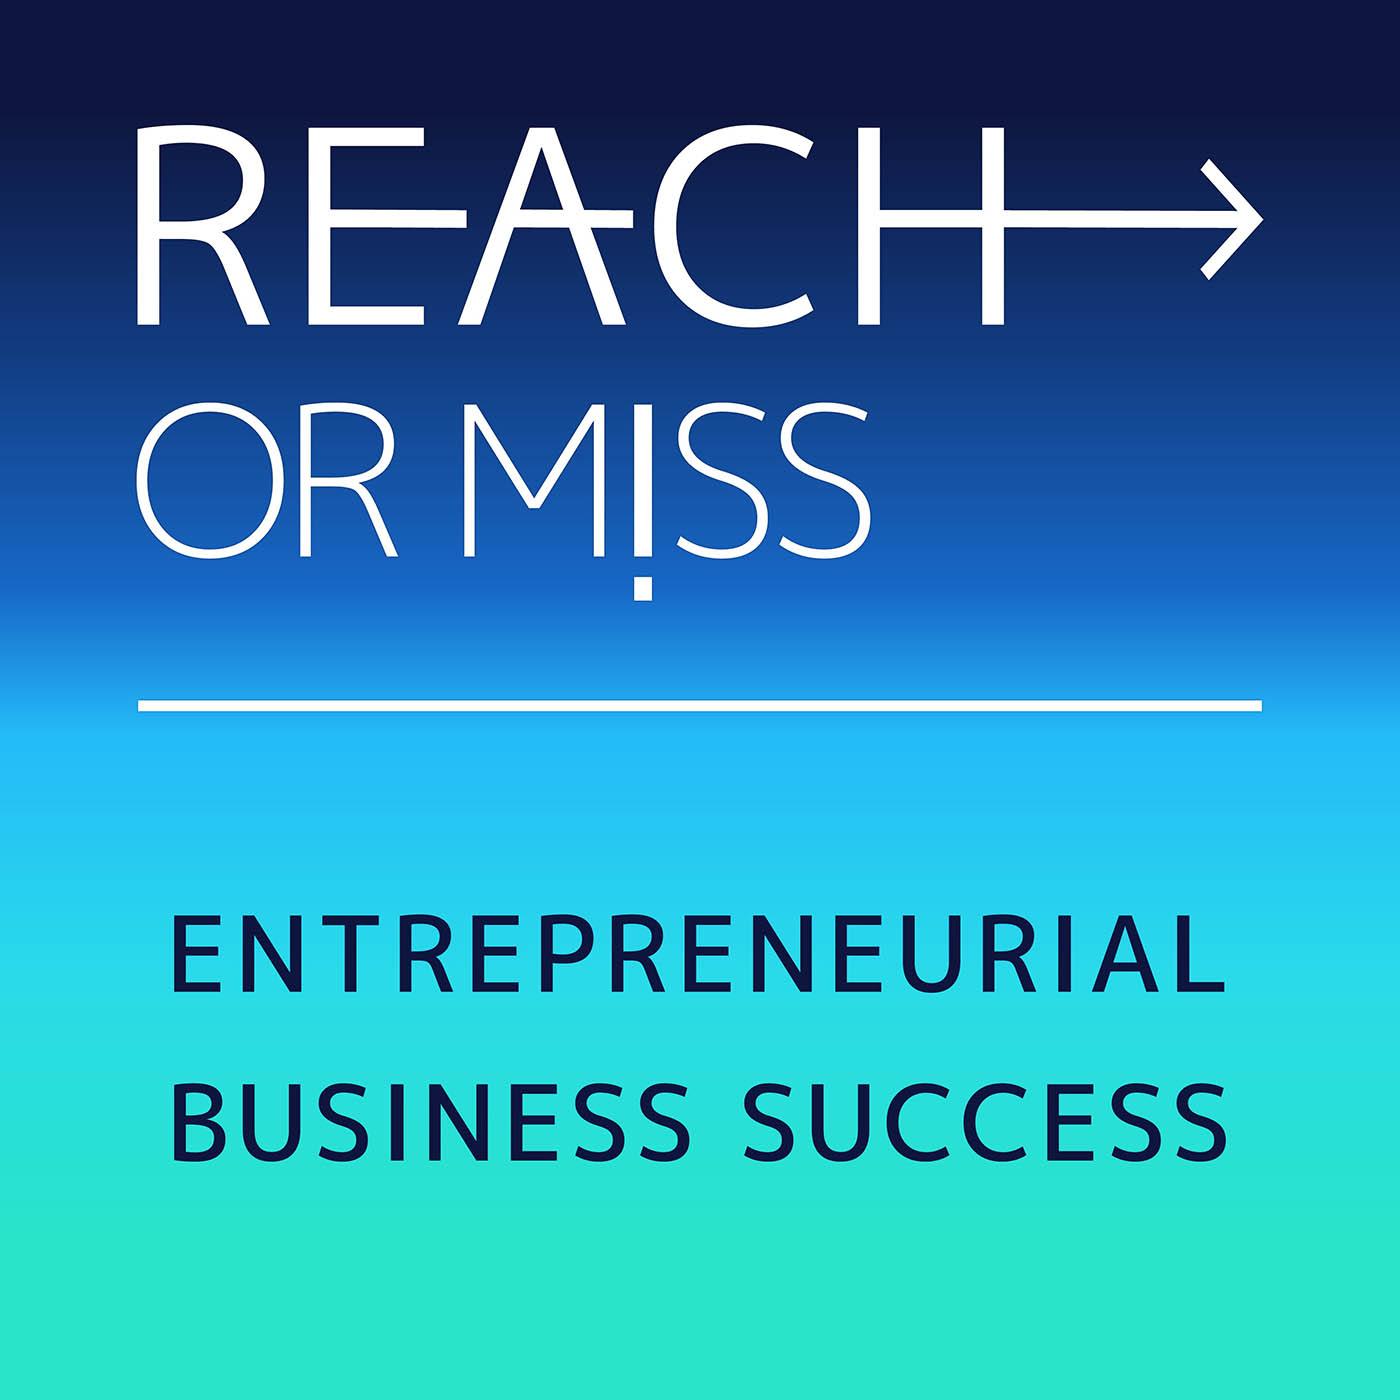 REACH OR MISS - Entrepreneurial Business Success